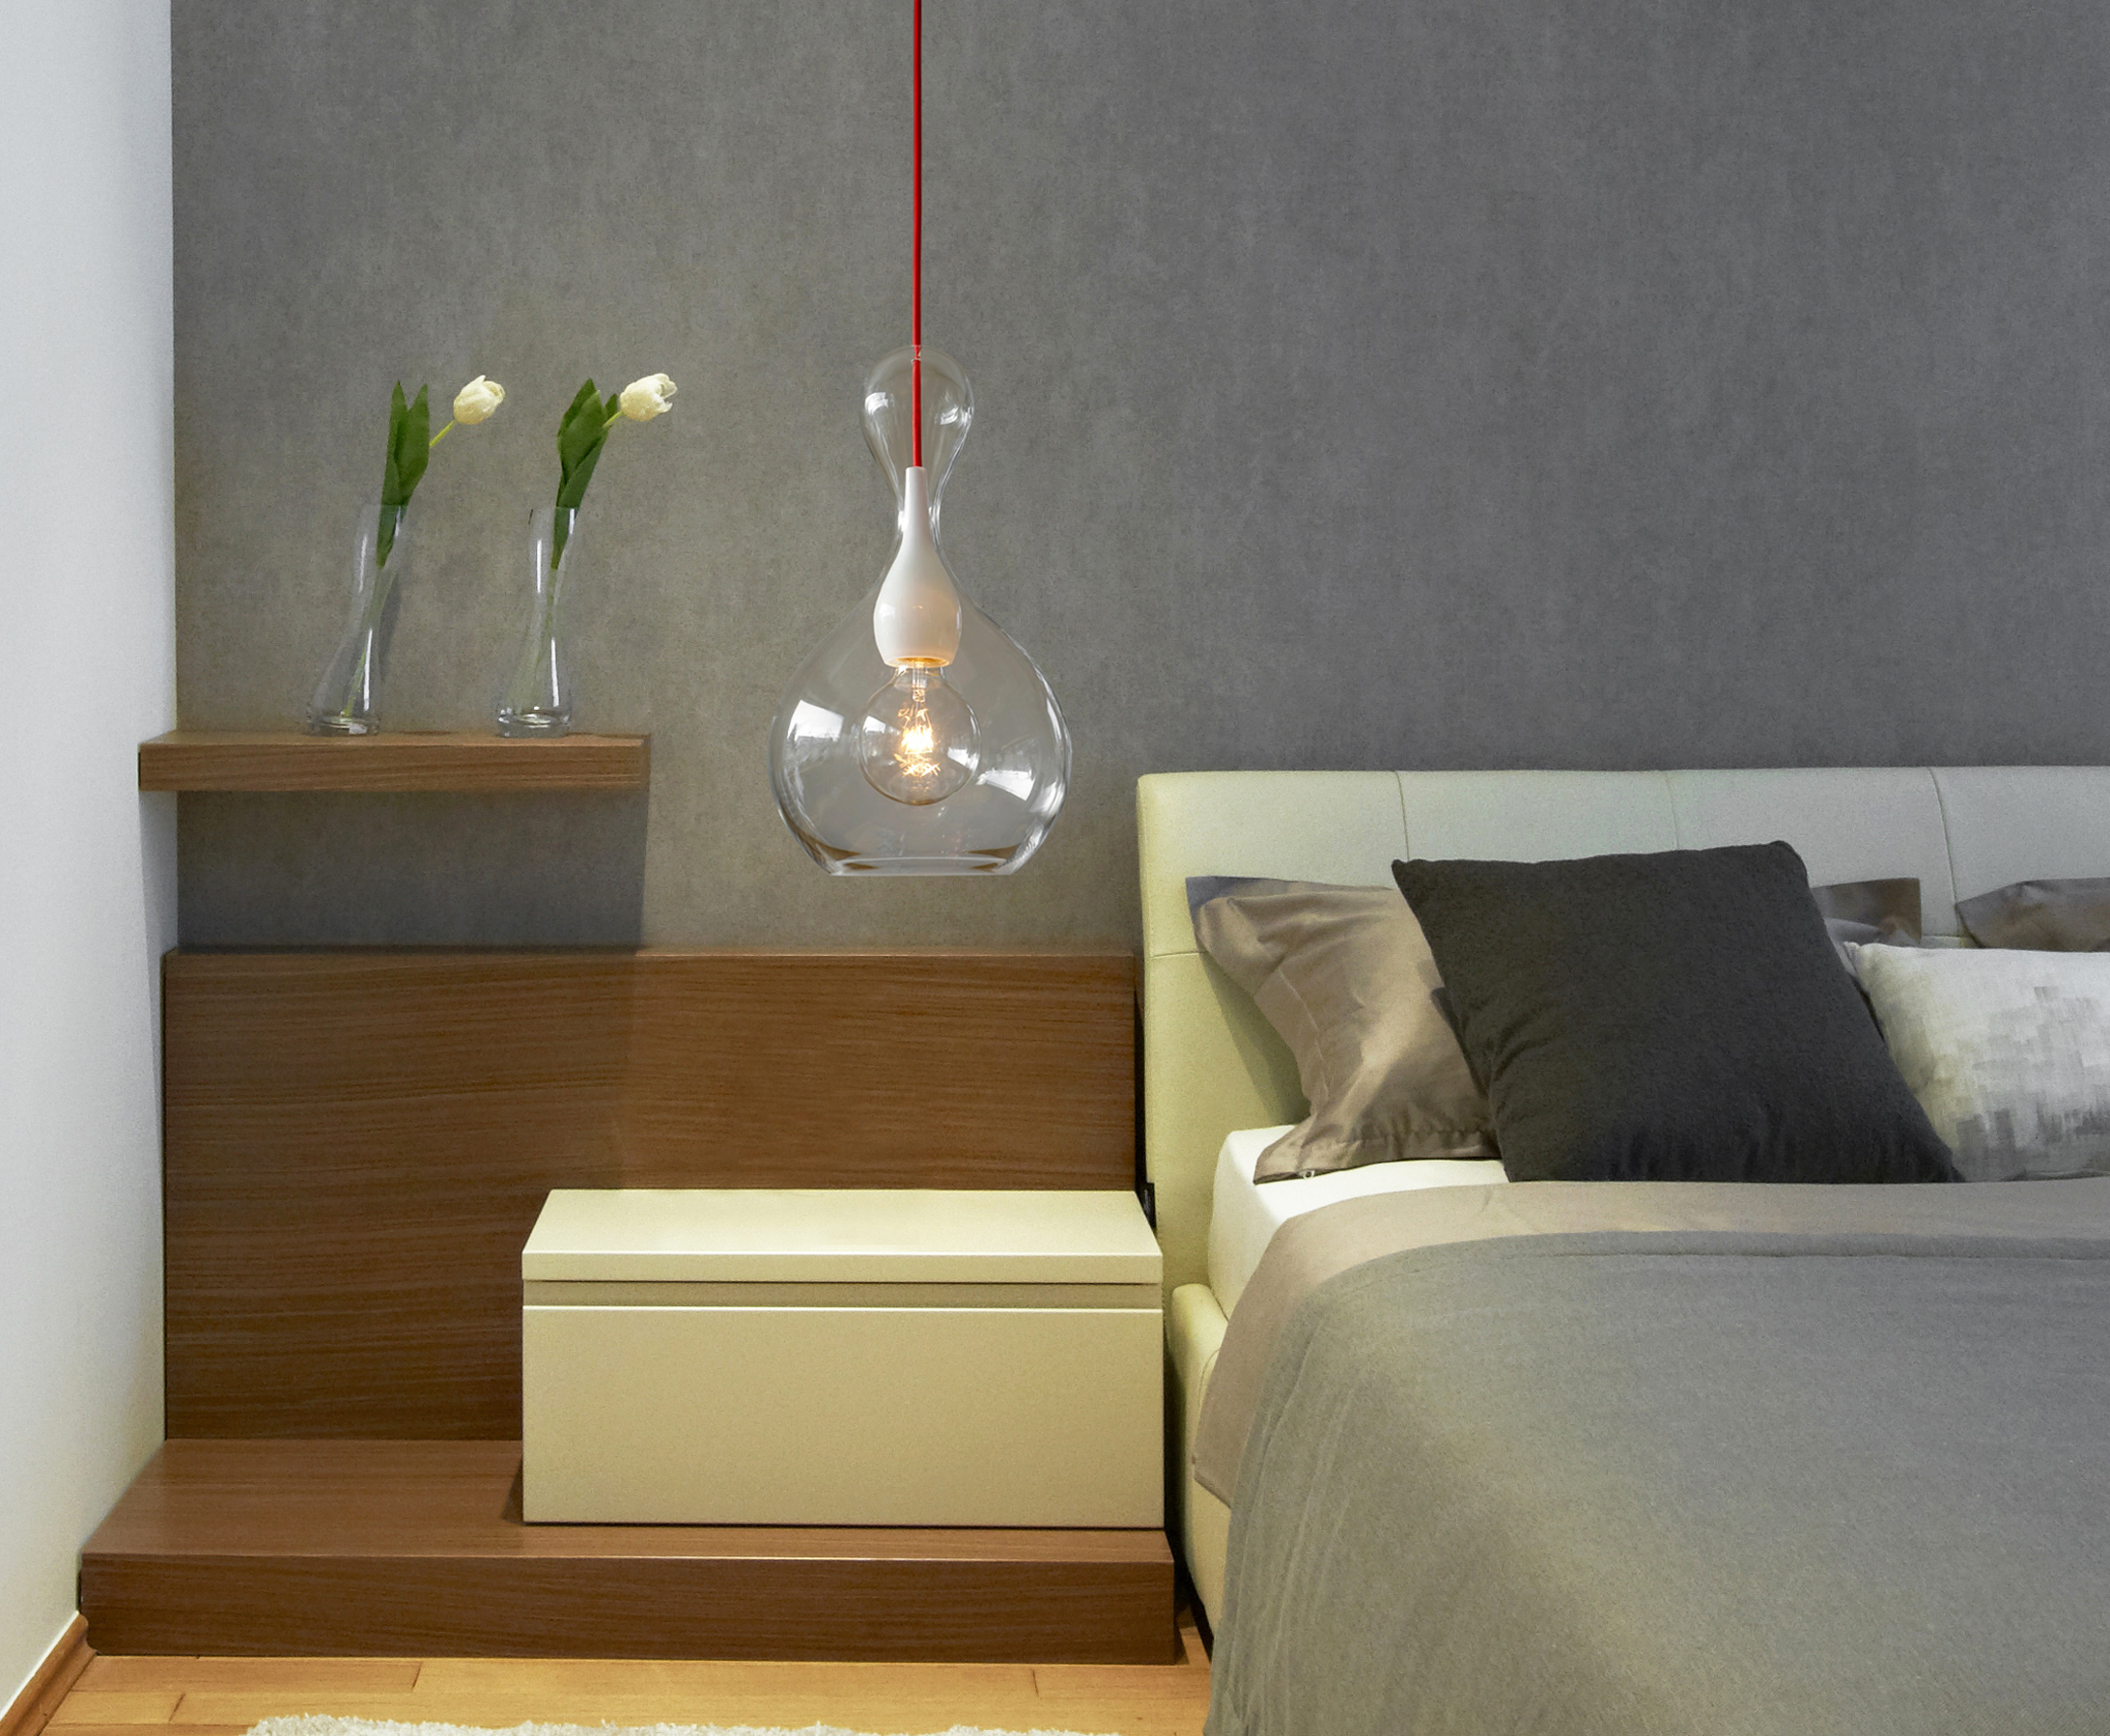 blubb pendel von next home collection stylepark. Black Bedroom Furniture Sets. Home Design Ideas